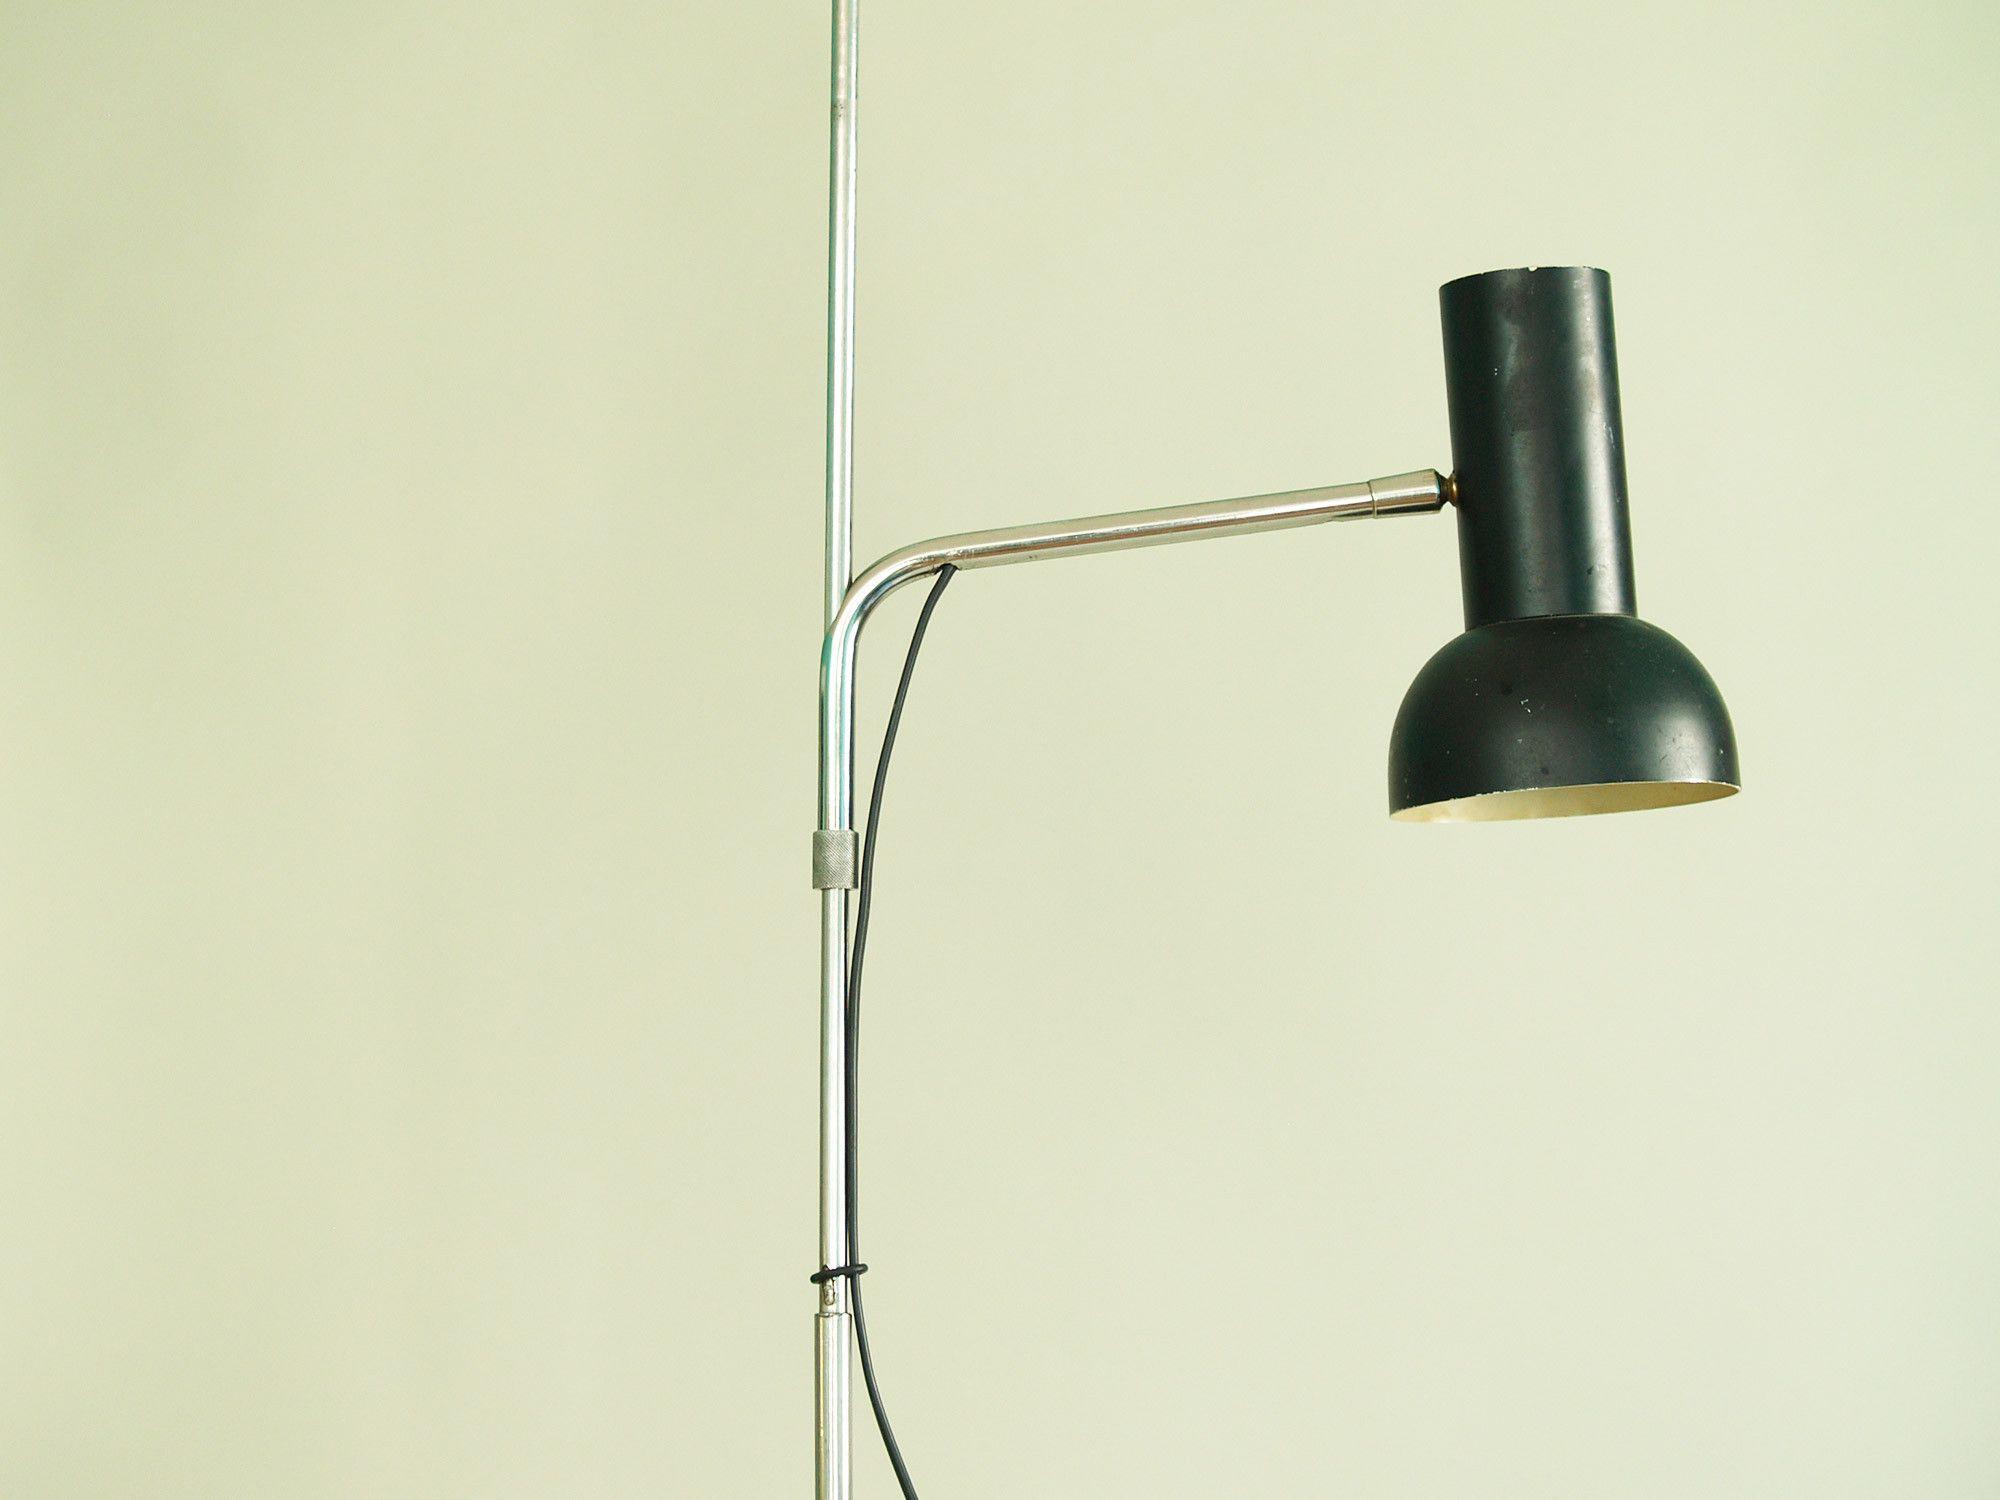 Lampadaire réglable / liseuse moderniste, France (vers 1960)..Modernist floor lamp, France (circa 1960)